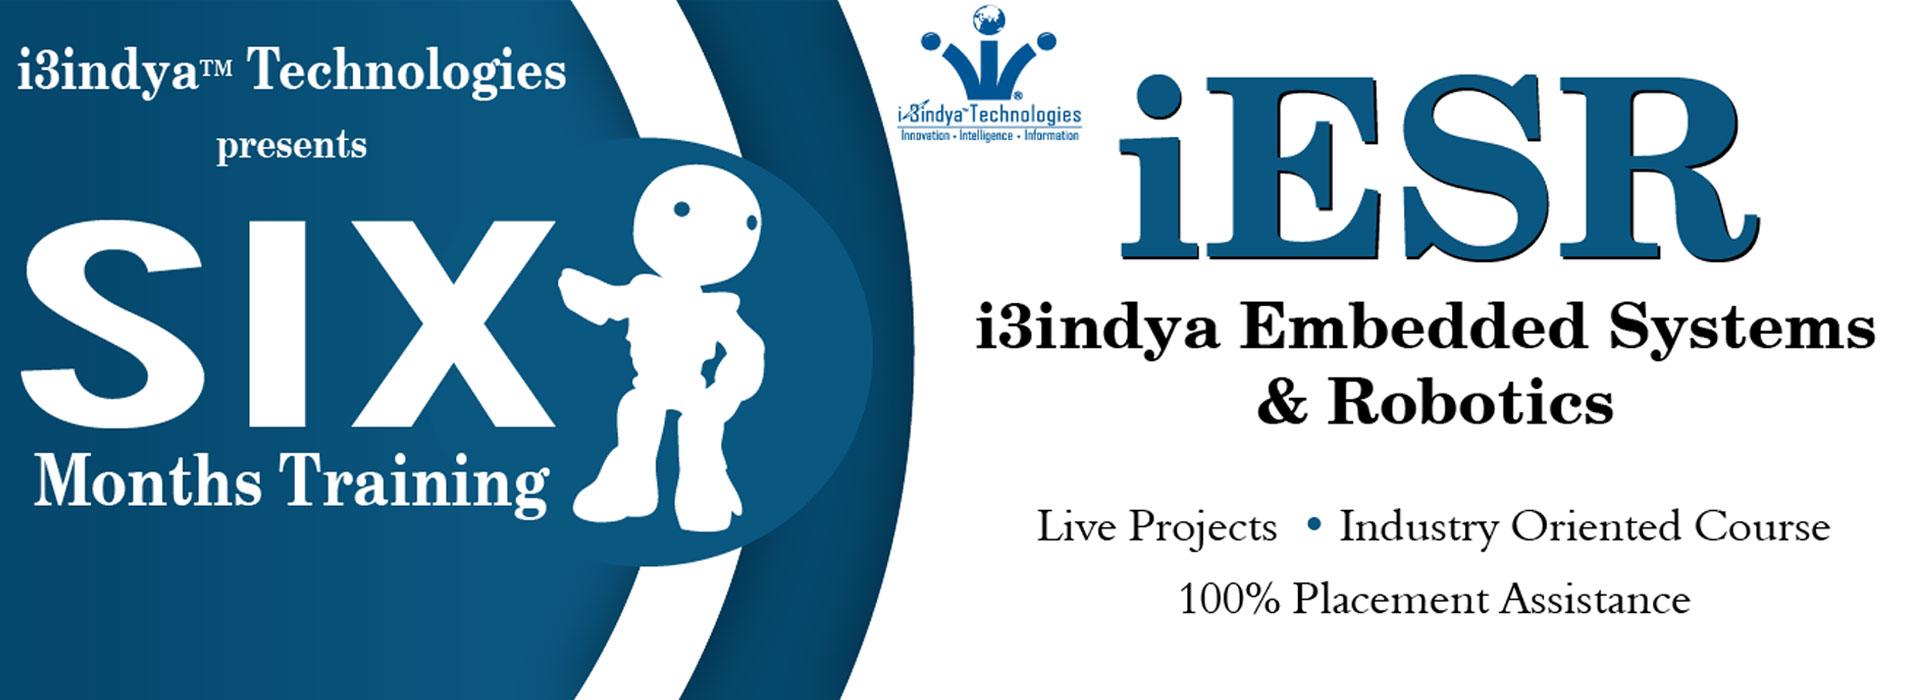 I3indya Embedded Systems Robotics Six Months Training I3indya